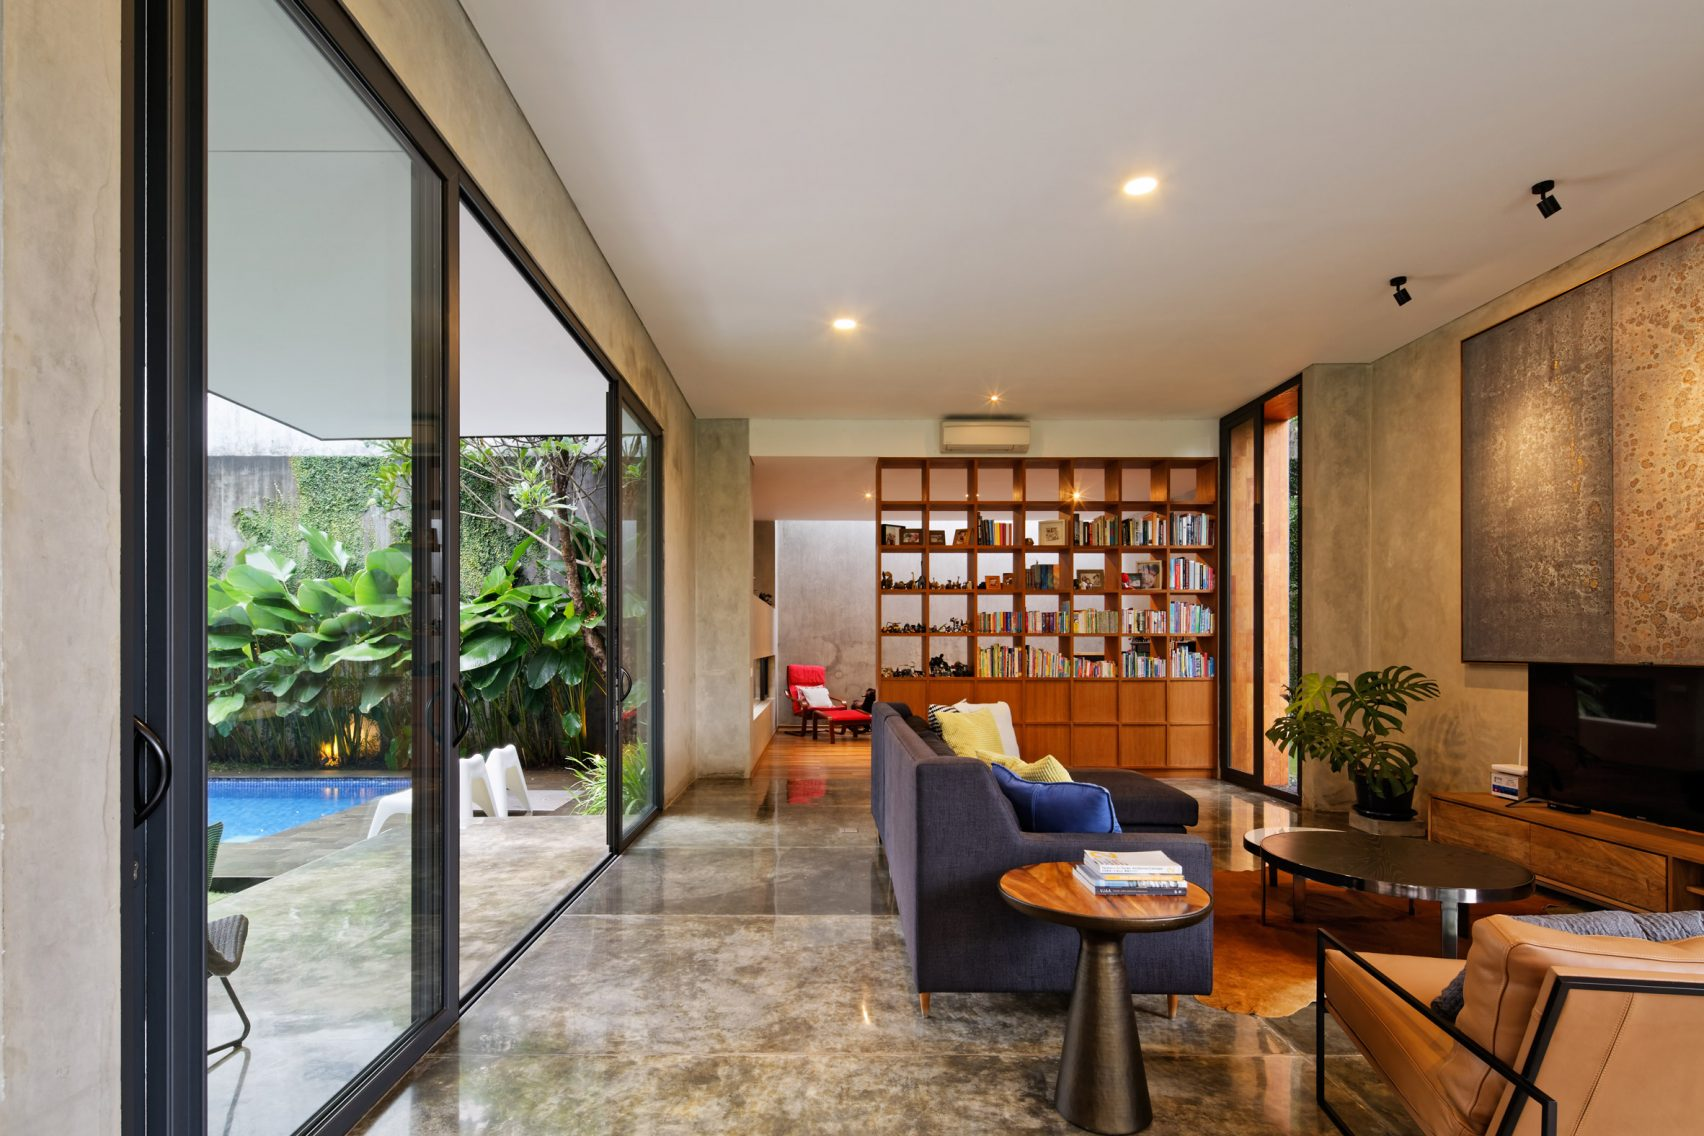 house-inside-outside-tamara-wibowo-architecture-residential-indonesia_dezeen_2364_col_2-1704x1136.jpg